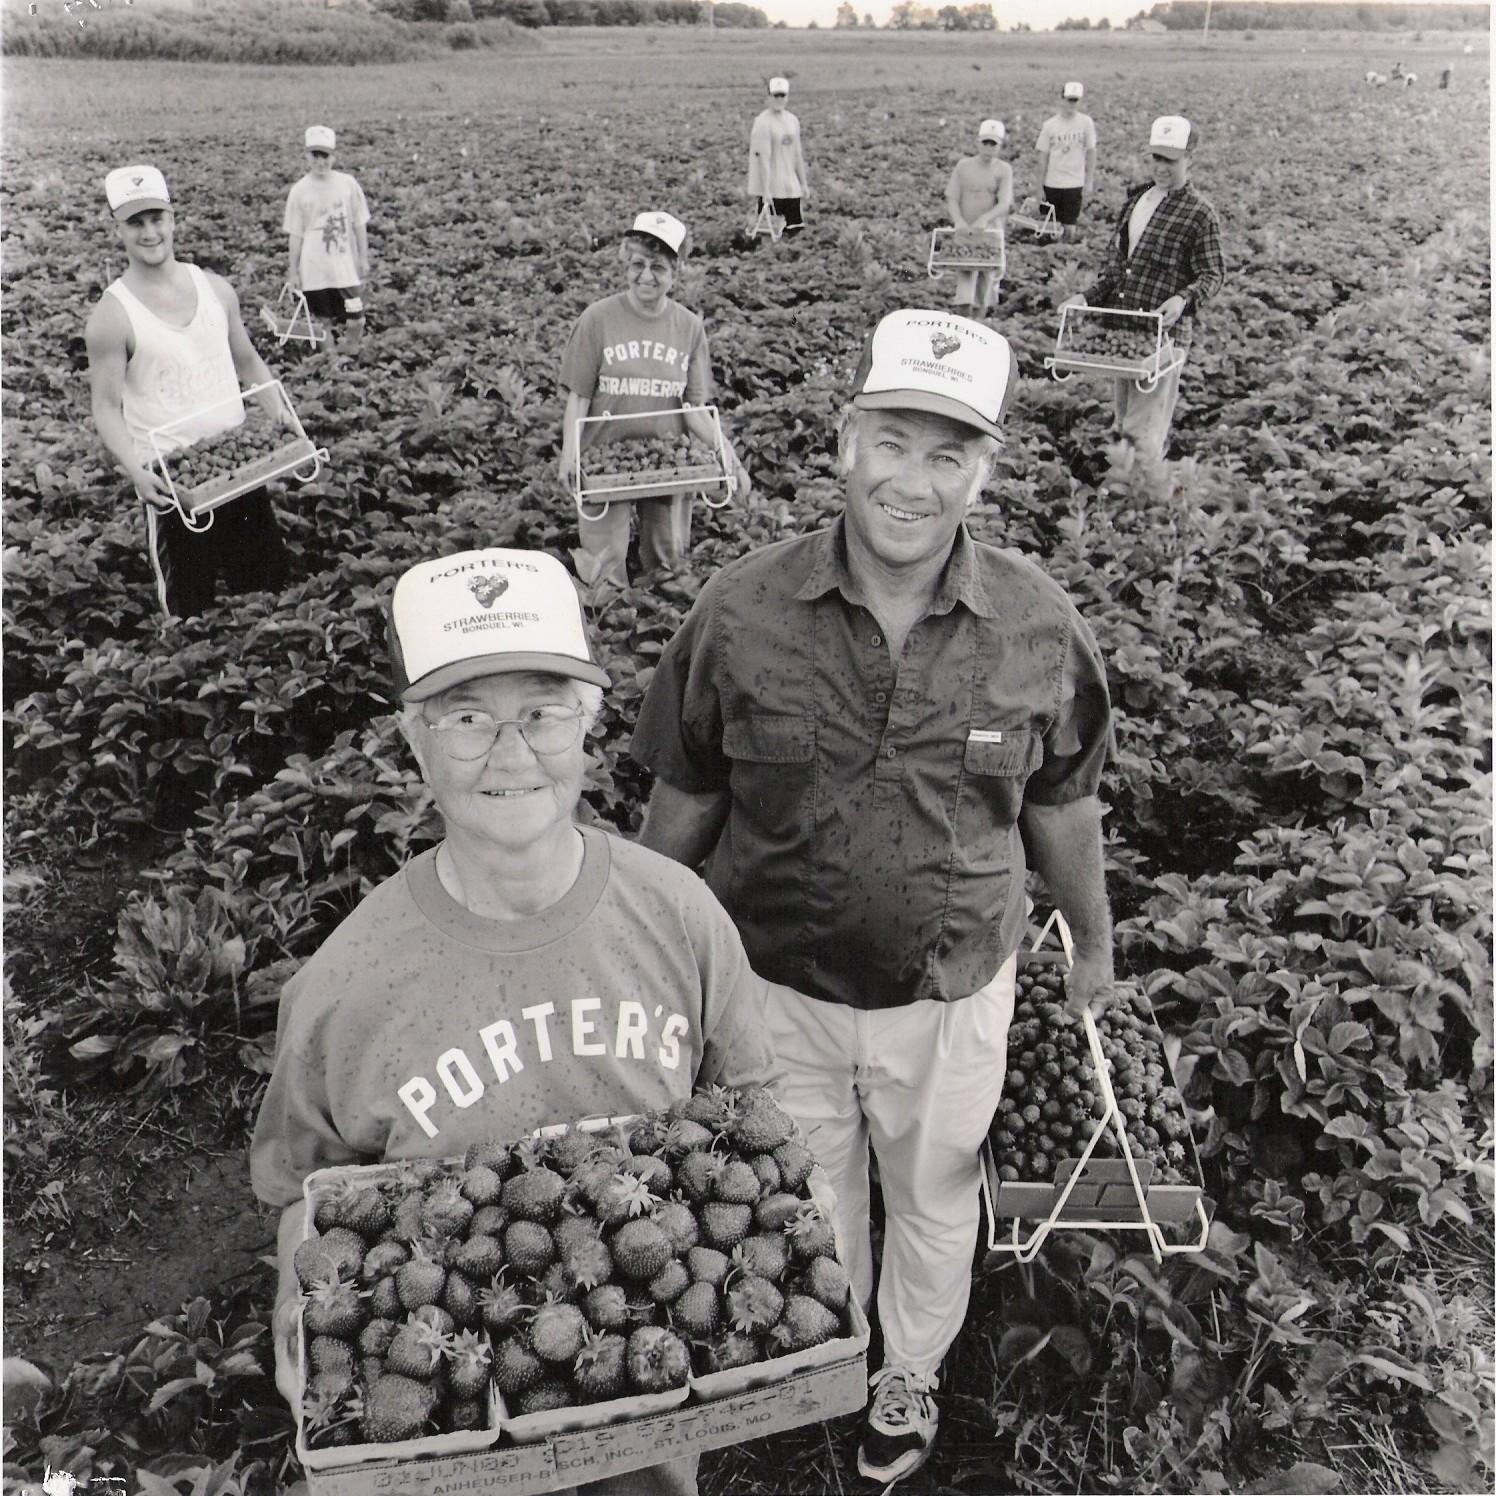 jeep porter picking strawberries